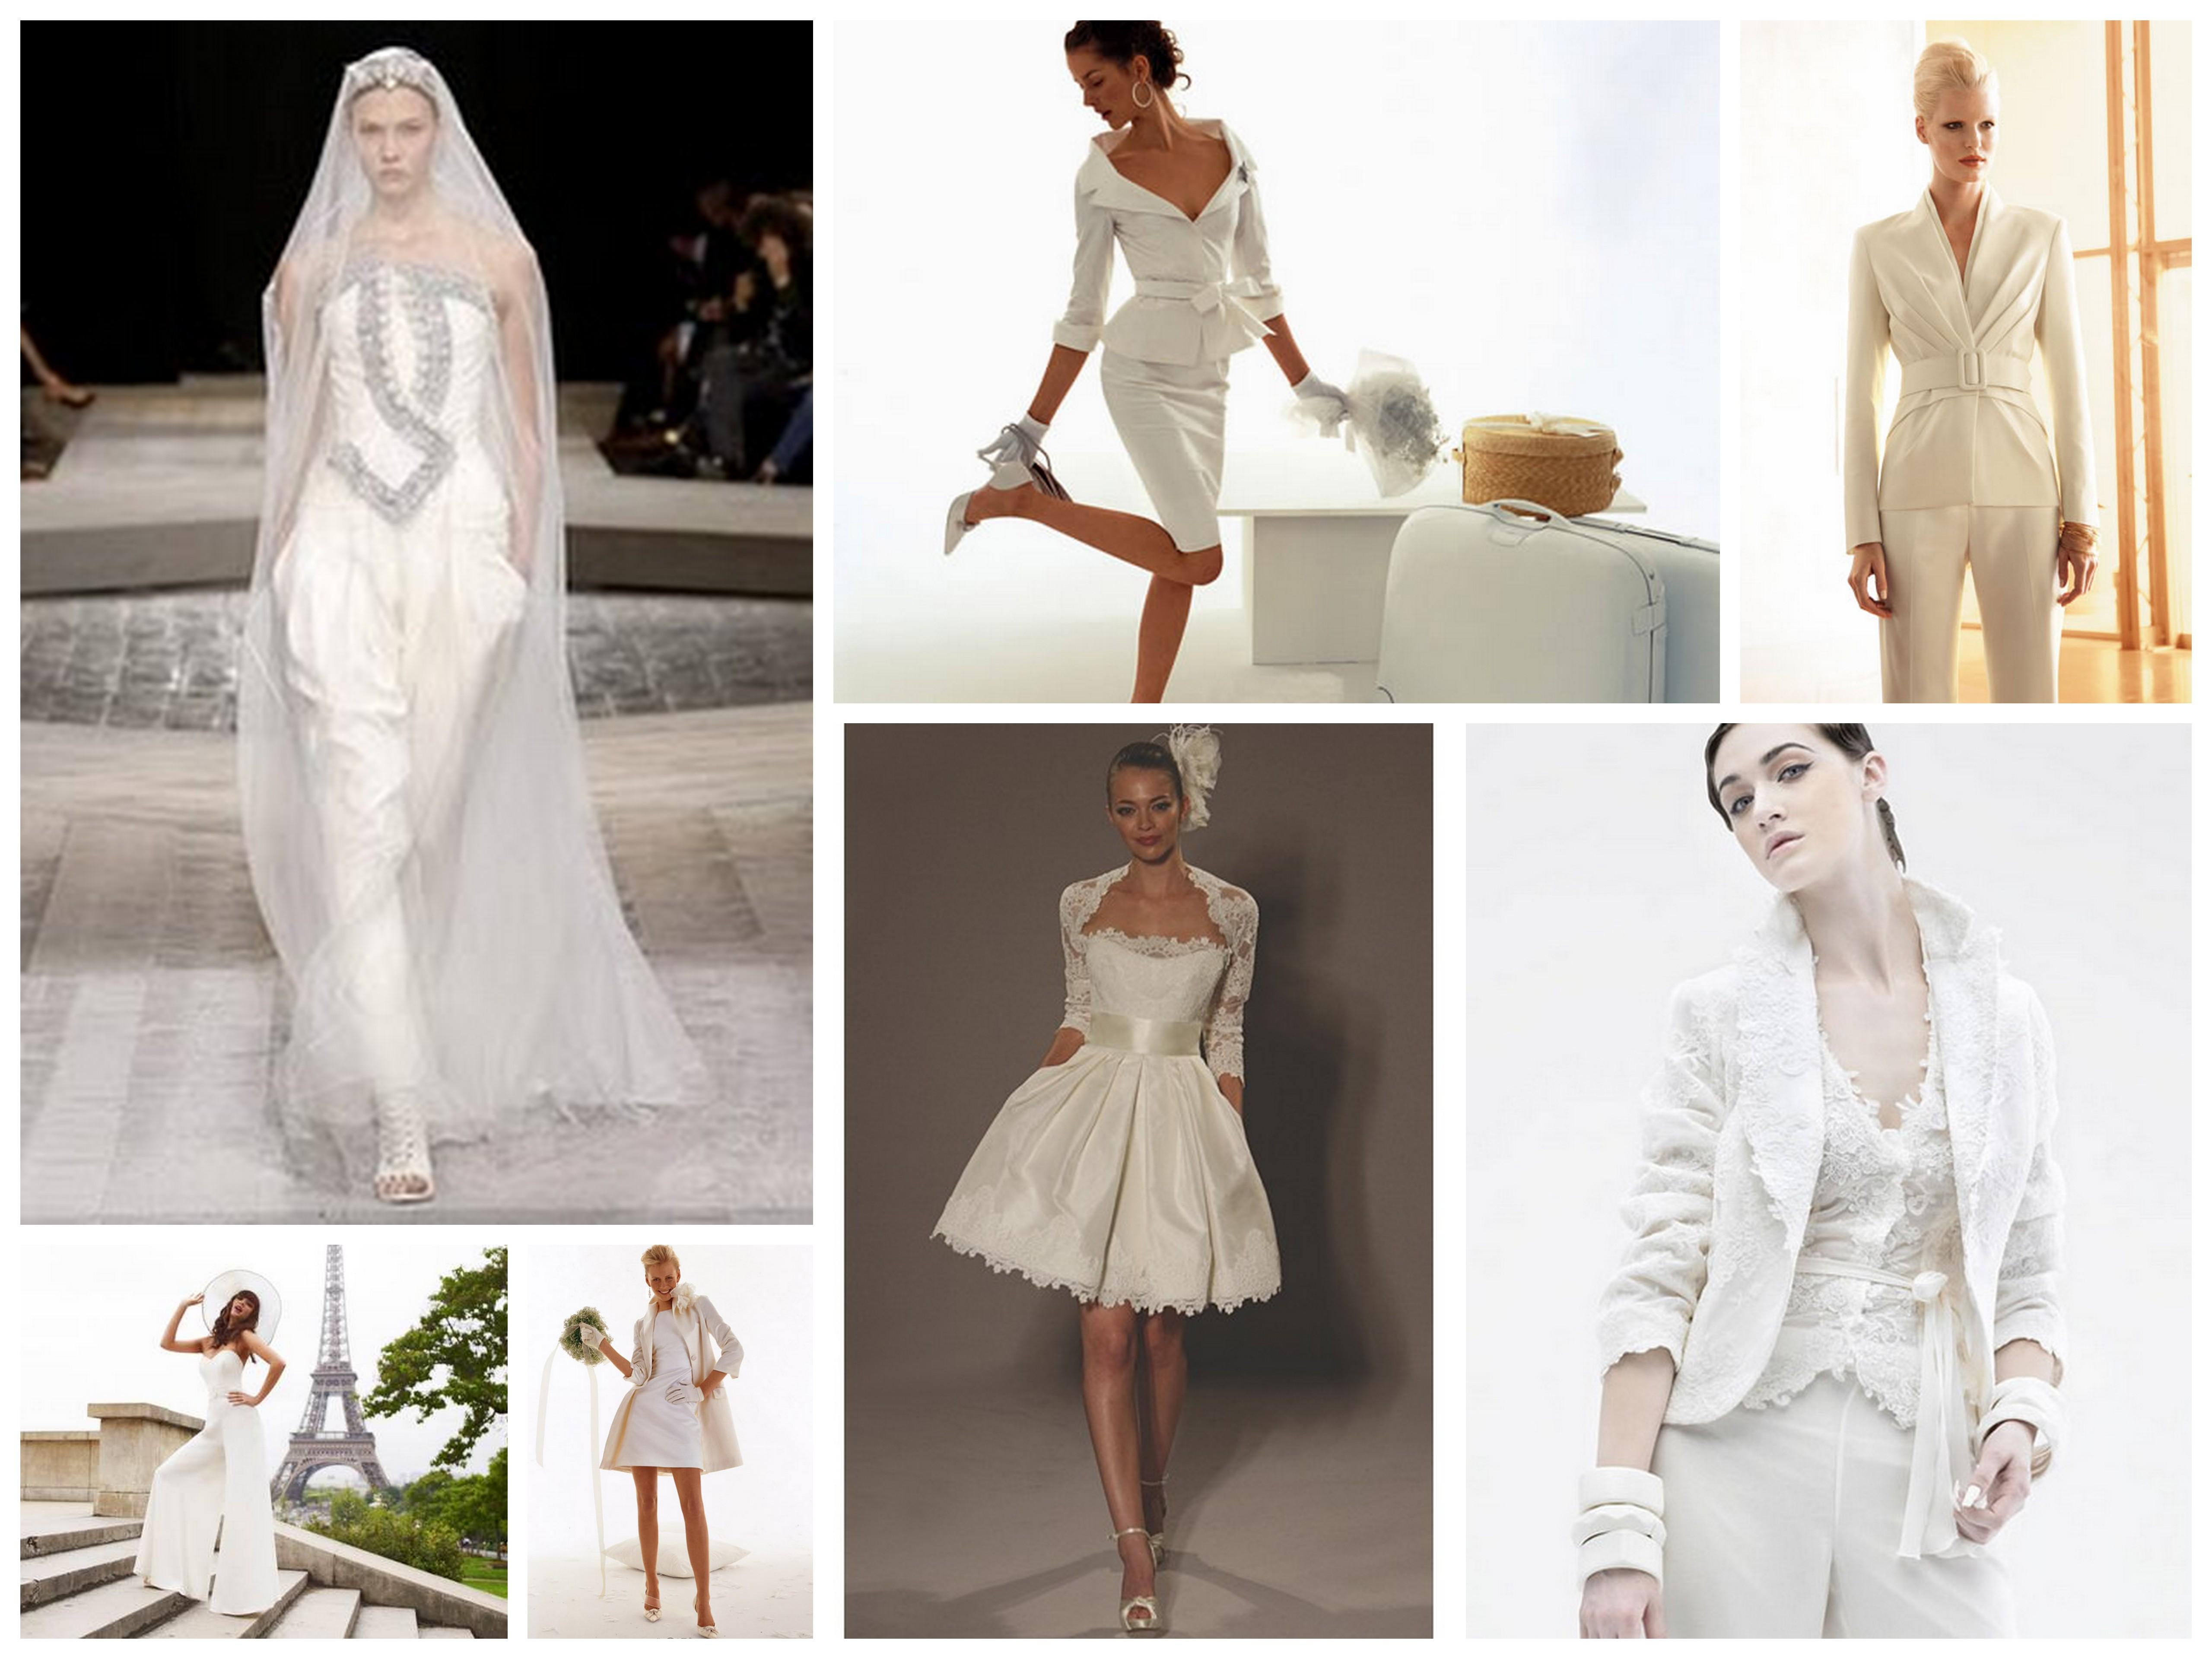 Wedding Dress Alternatives Collage | Fantastical Wedding Stylings